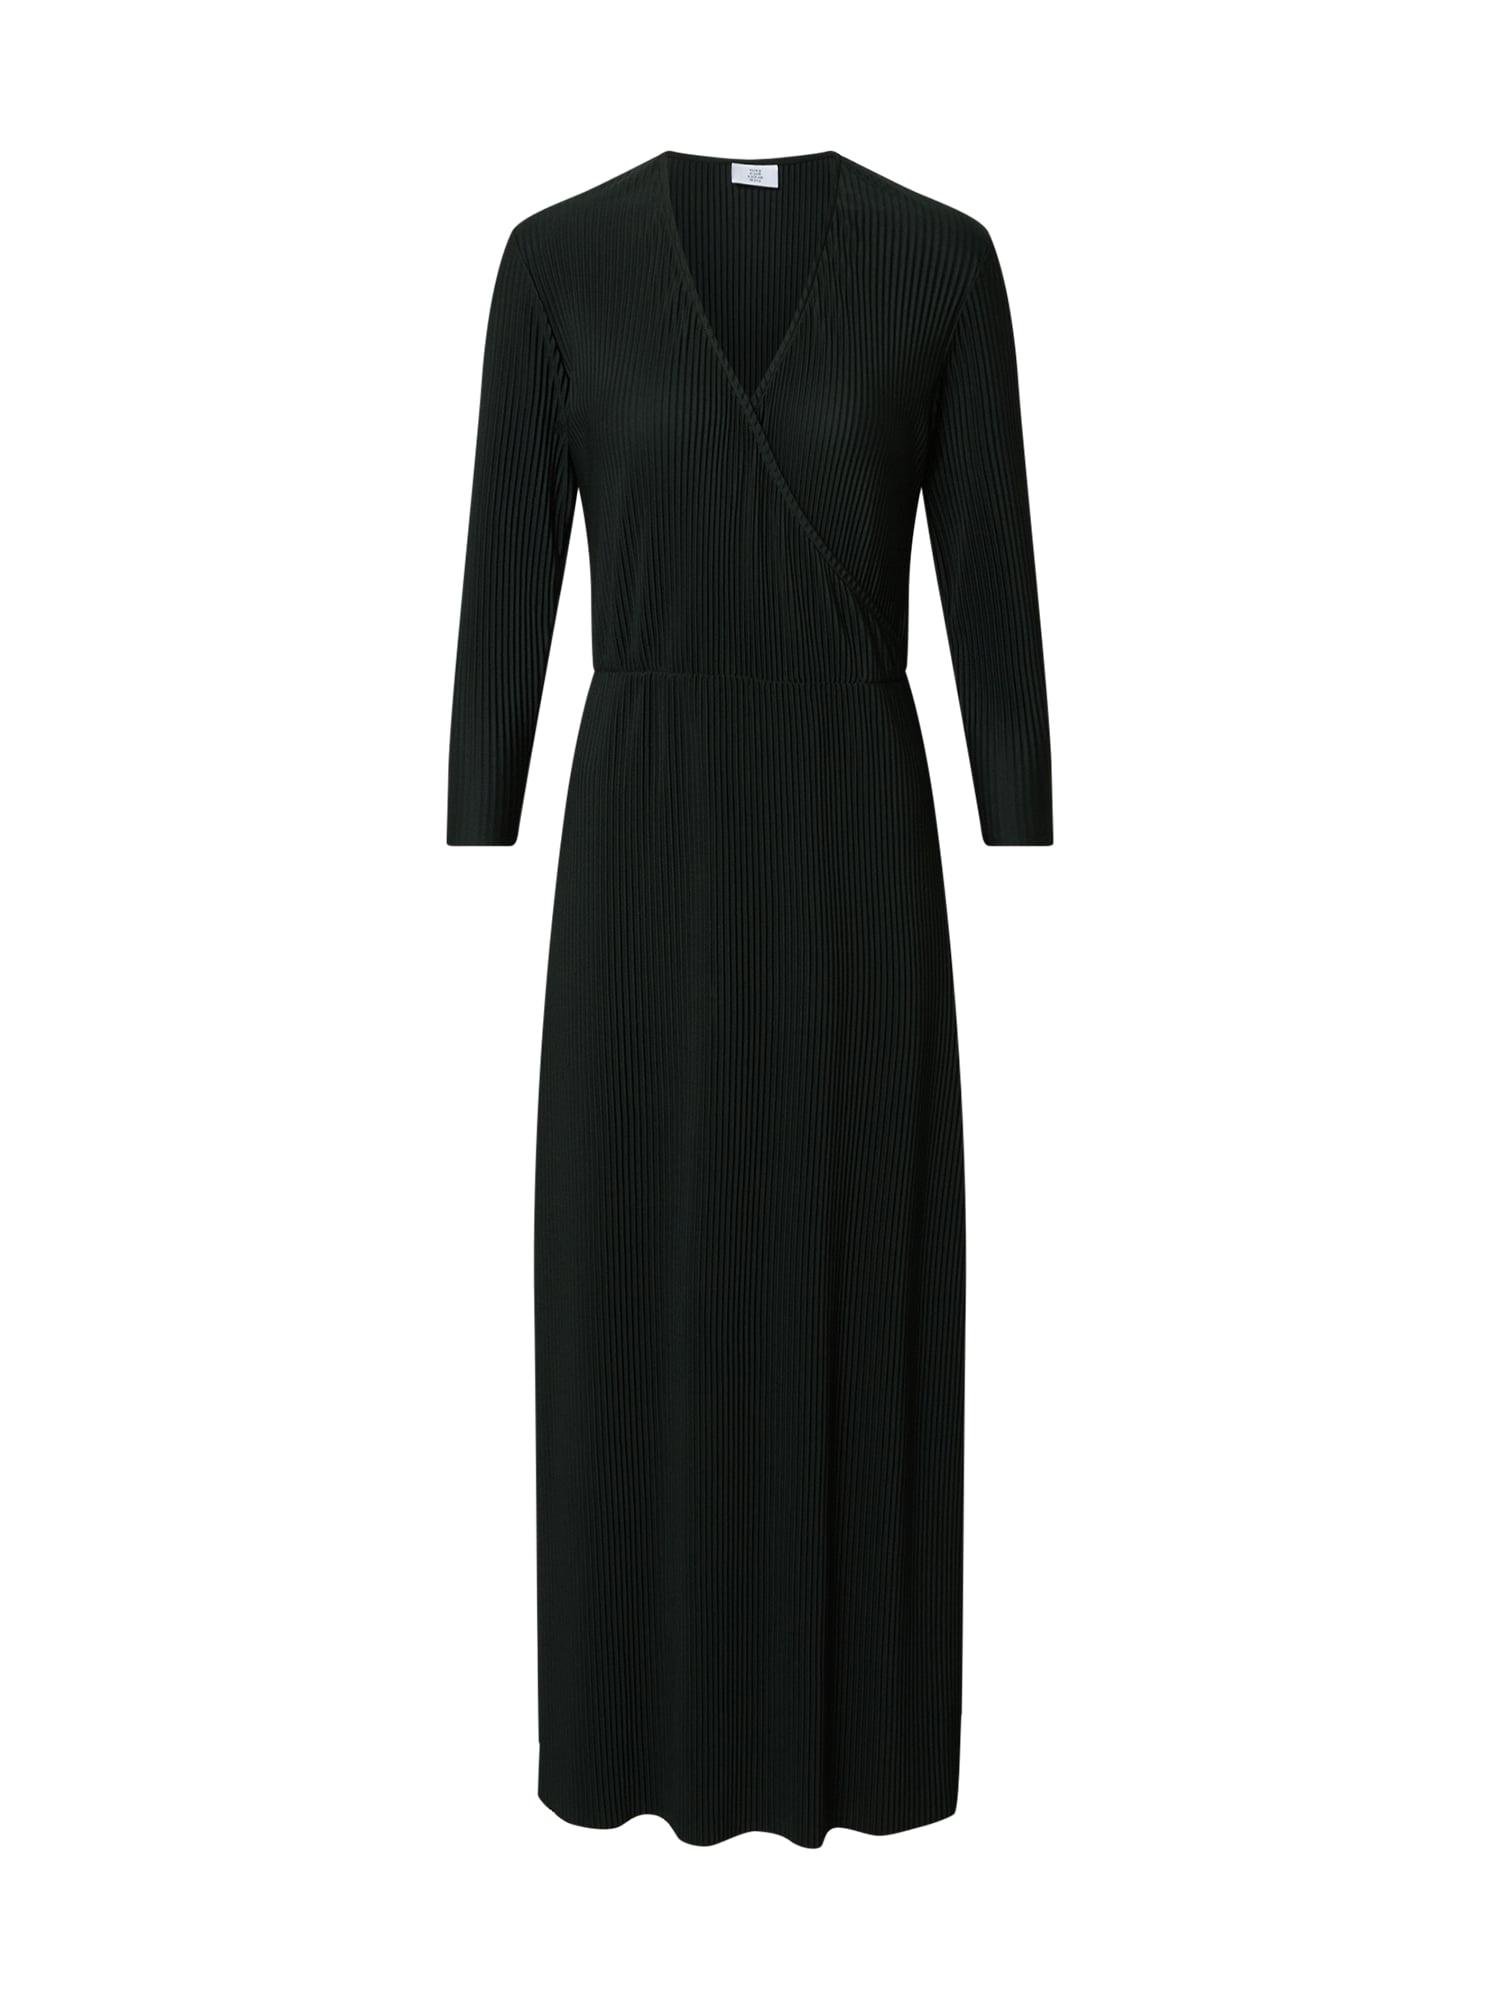 Kauf Dich Glücklich Suknelė įdegio spalva